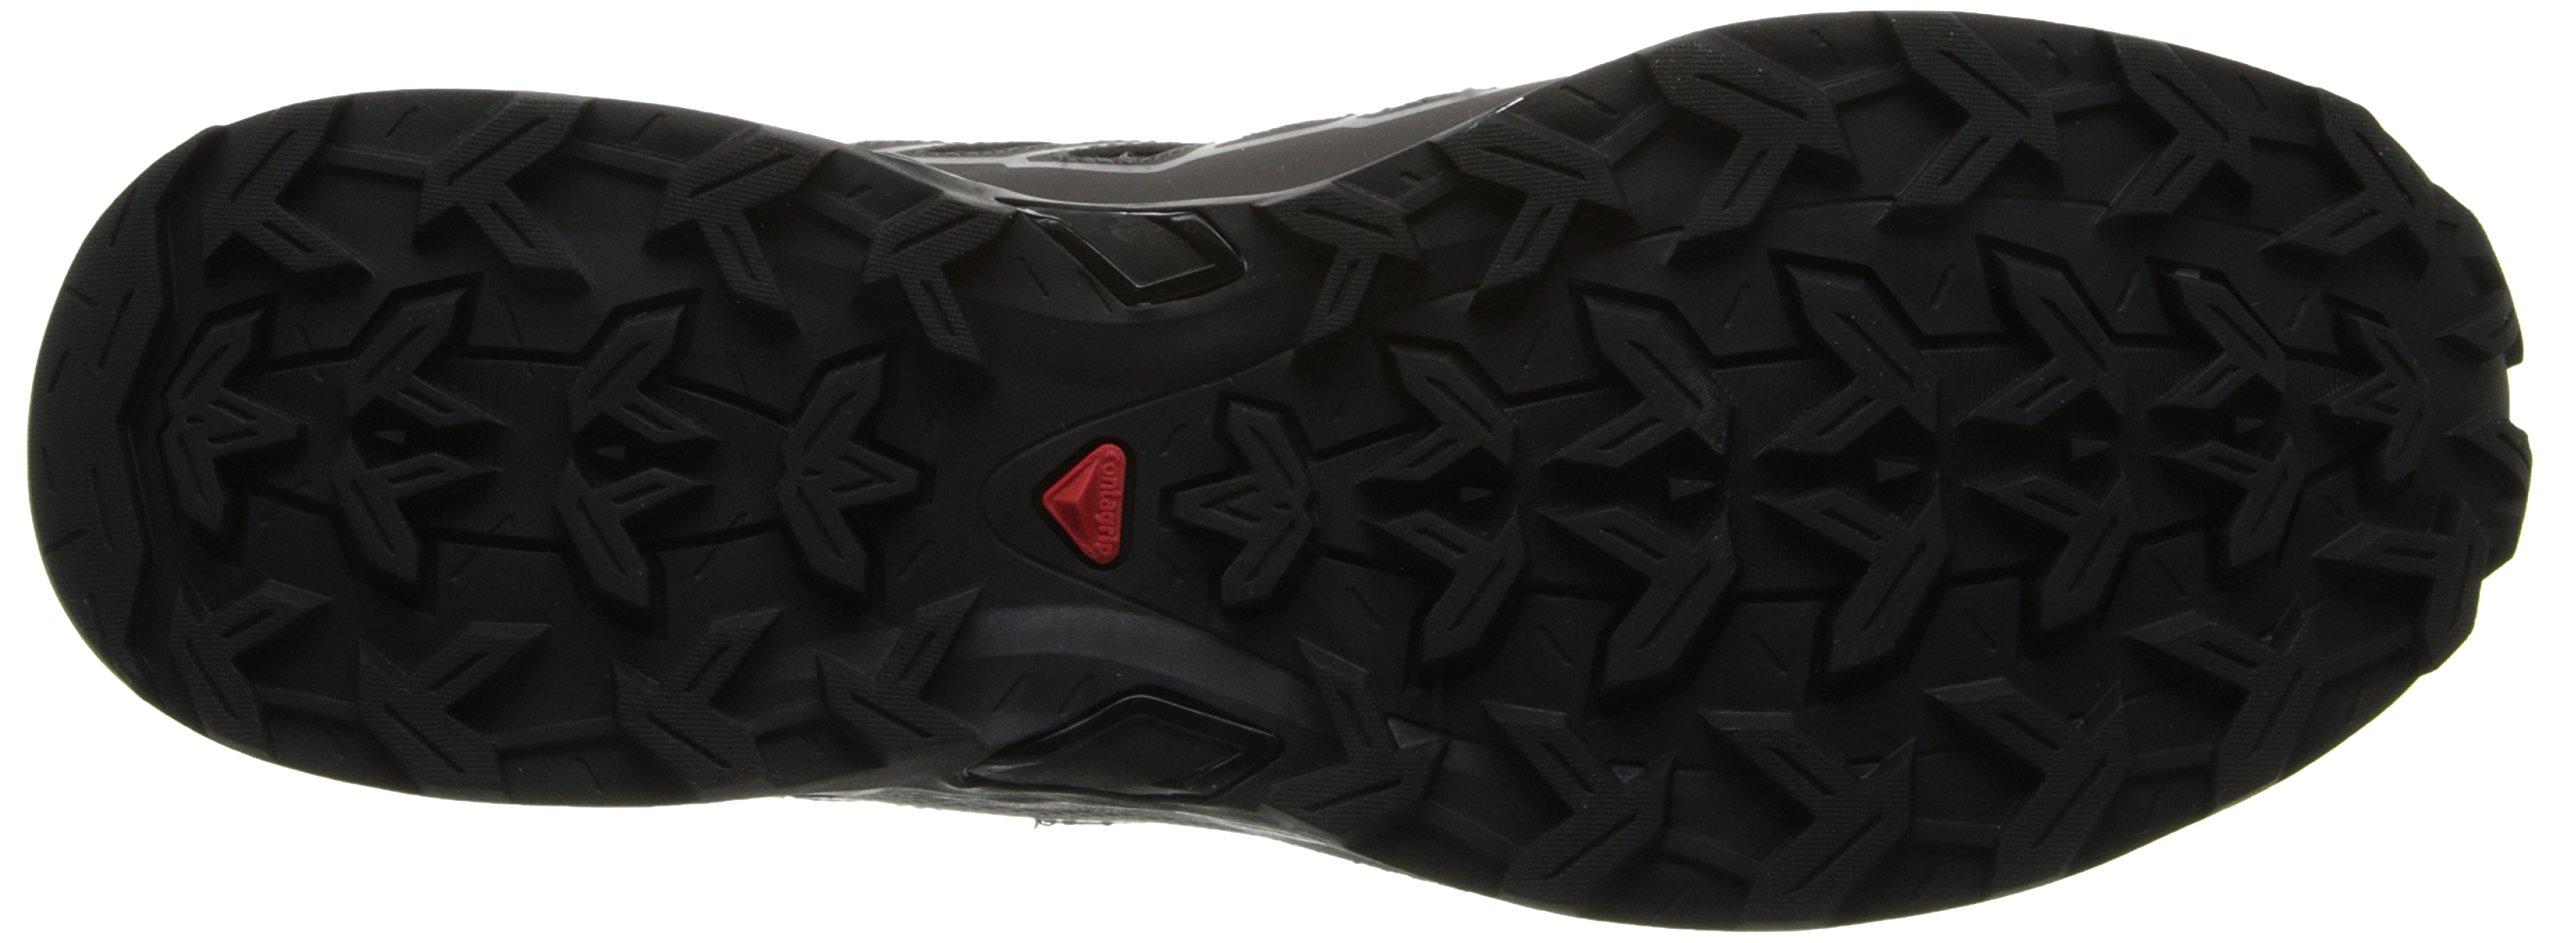 Salomon Men's X Ultra 2 GTX Hiking Shoe, Black/Autobahn/Aluminum, 7 M US by Salomon (Image #3)